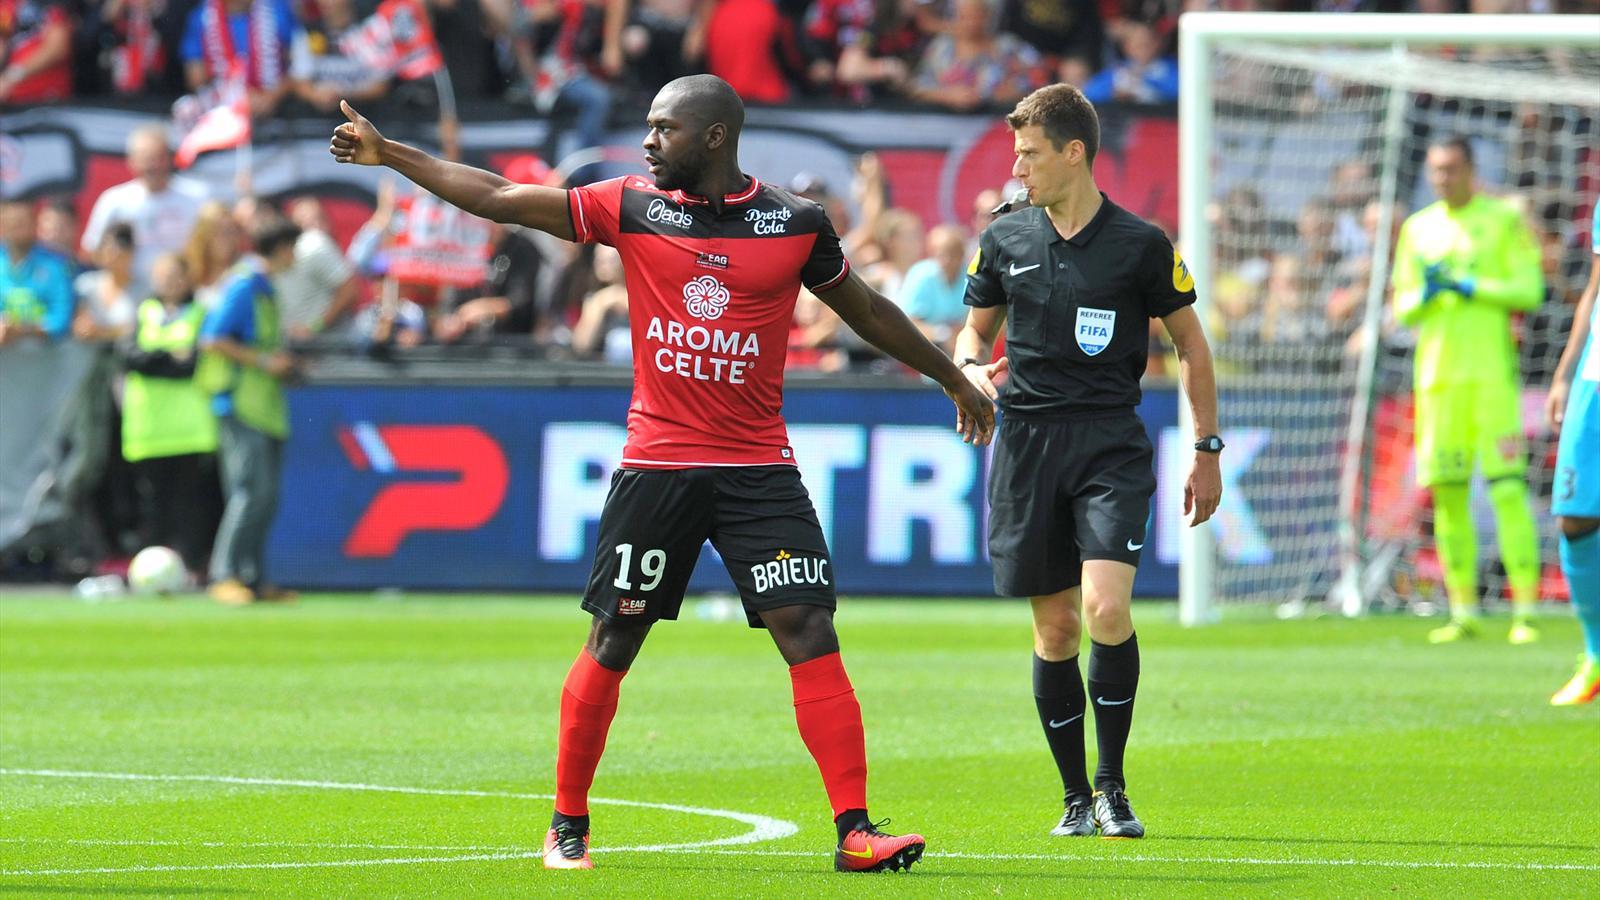 Calendrier et r sultats ligue 1 2016 2017 football - Calendrier coupe d europe foot ...